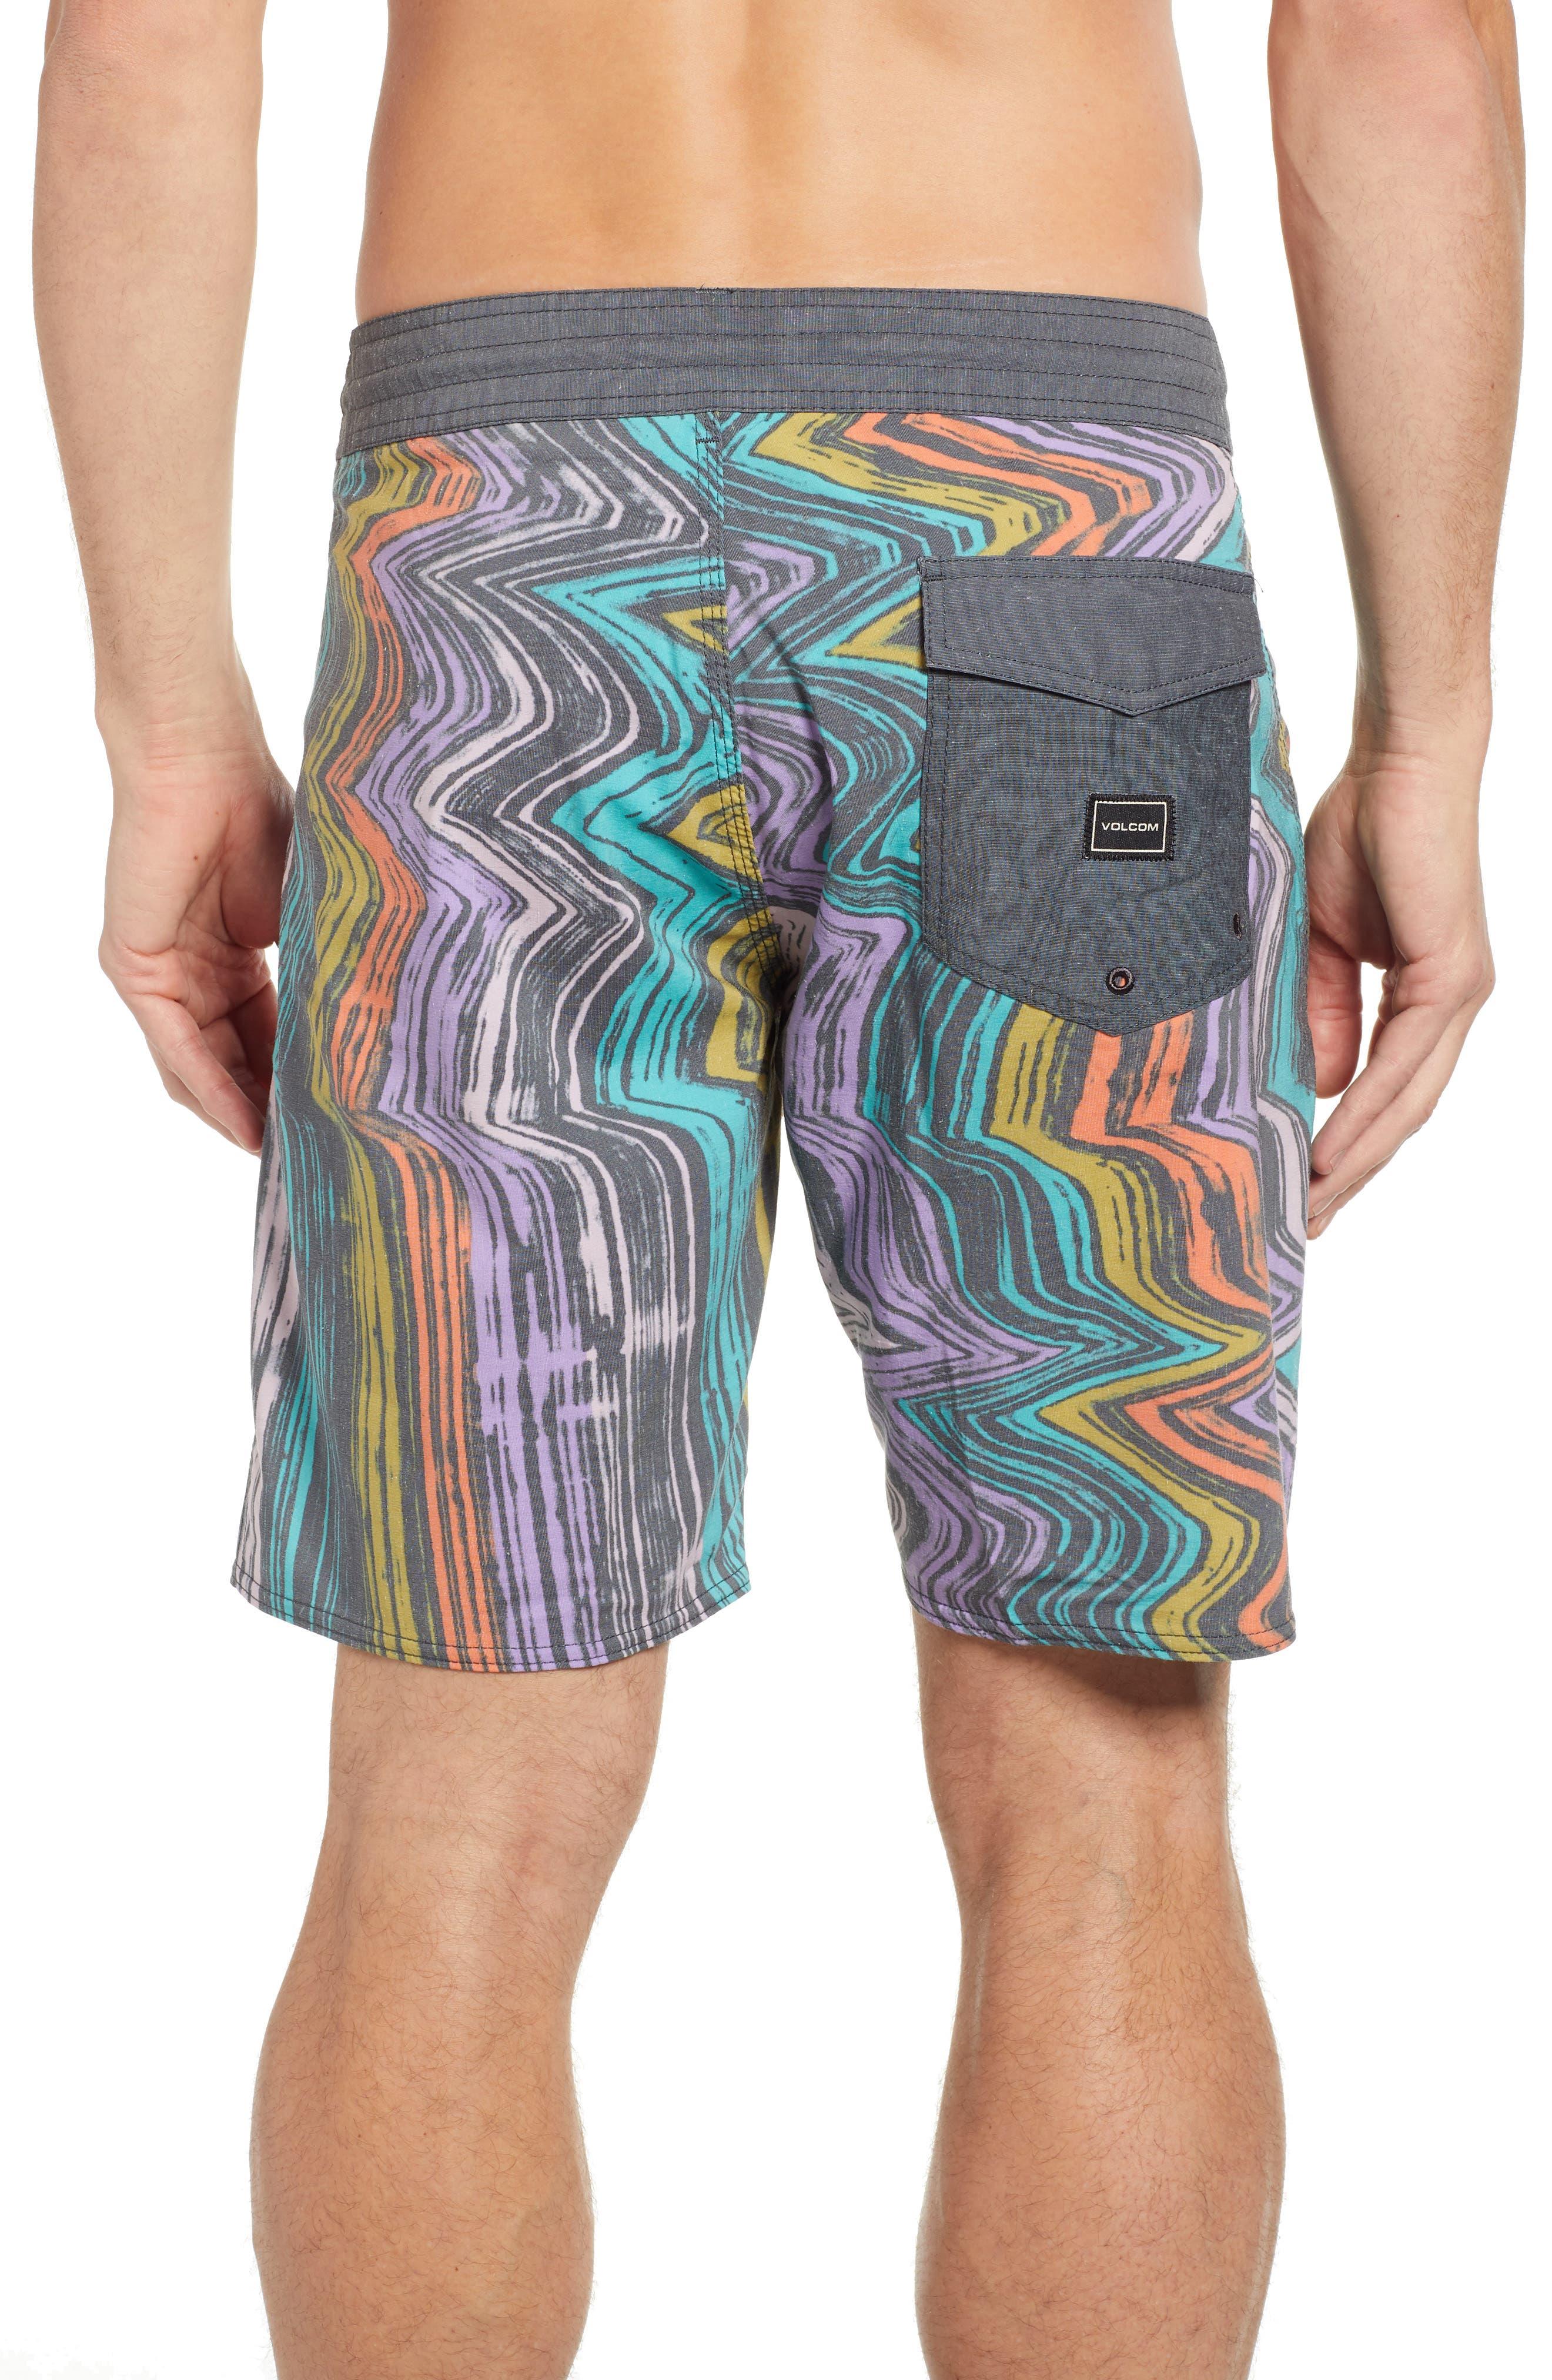 Lo-Fi Stoney Board Shorts,                             Alternate thumbnail 2, color,                             ASPHALT BLACK